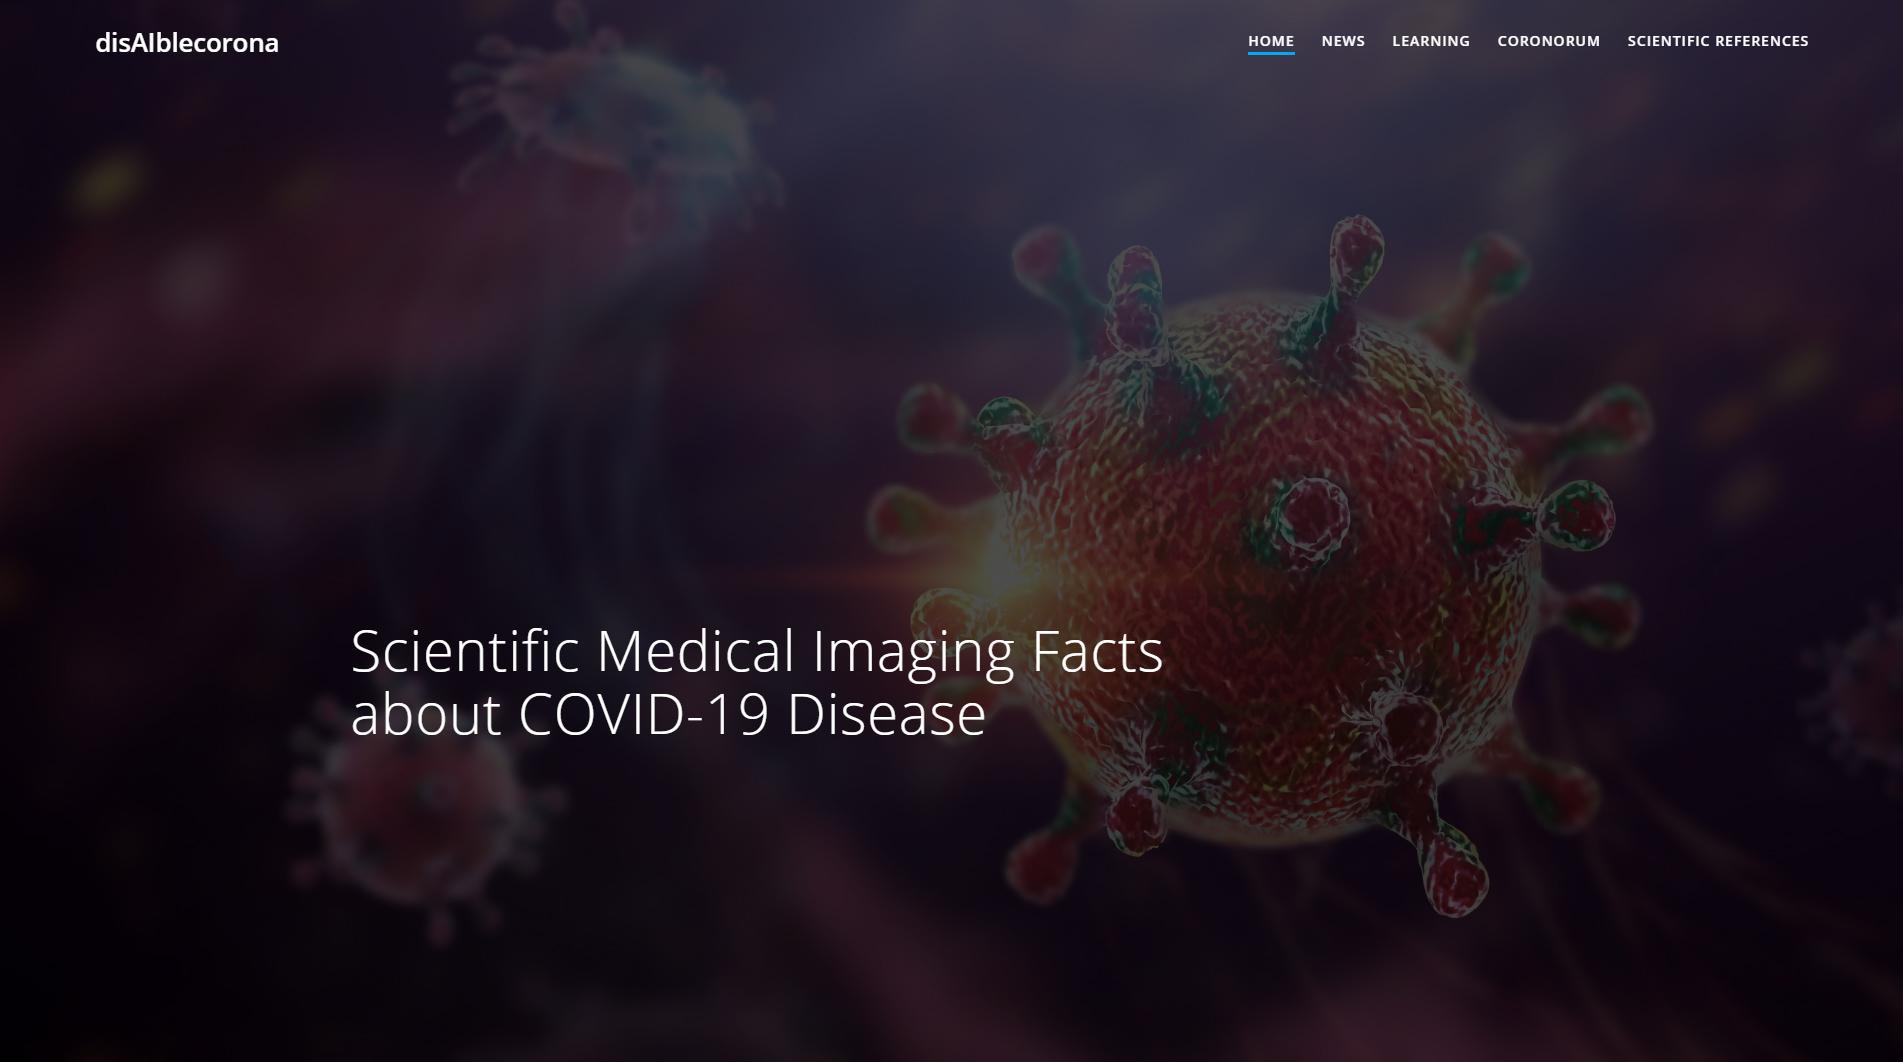 IMAGE startet erstes Corona-Lernportal für Radiologen